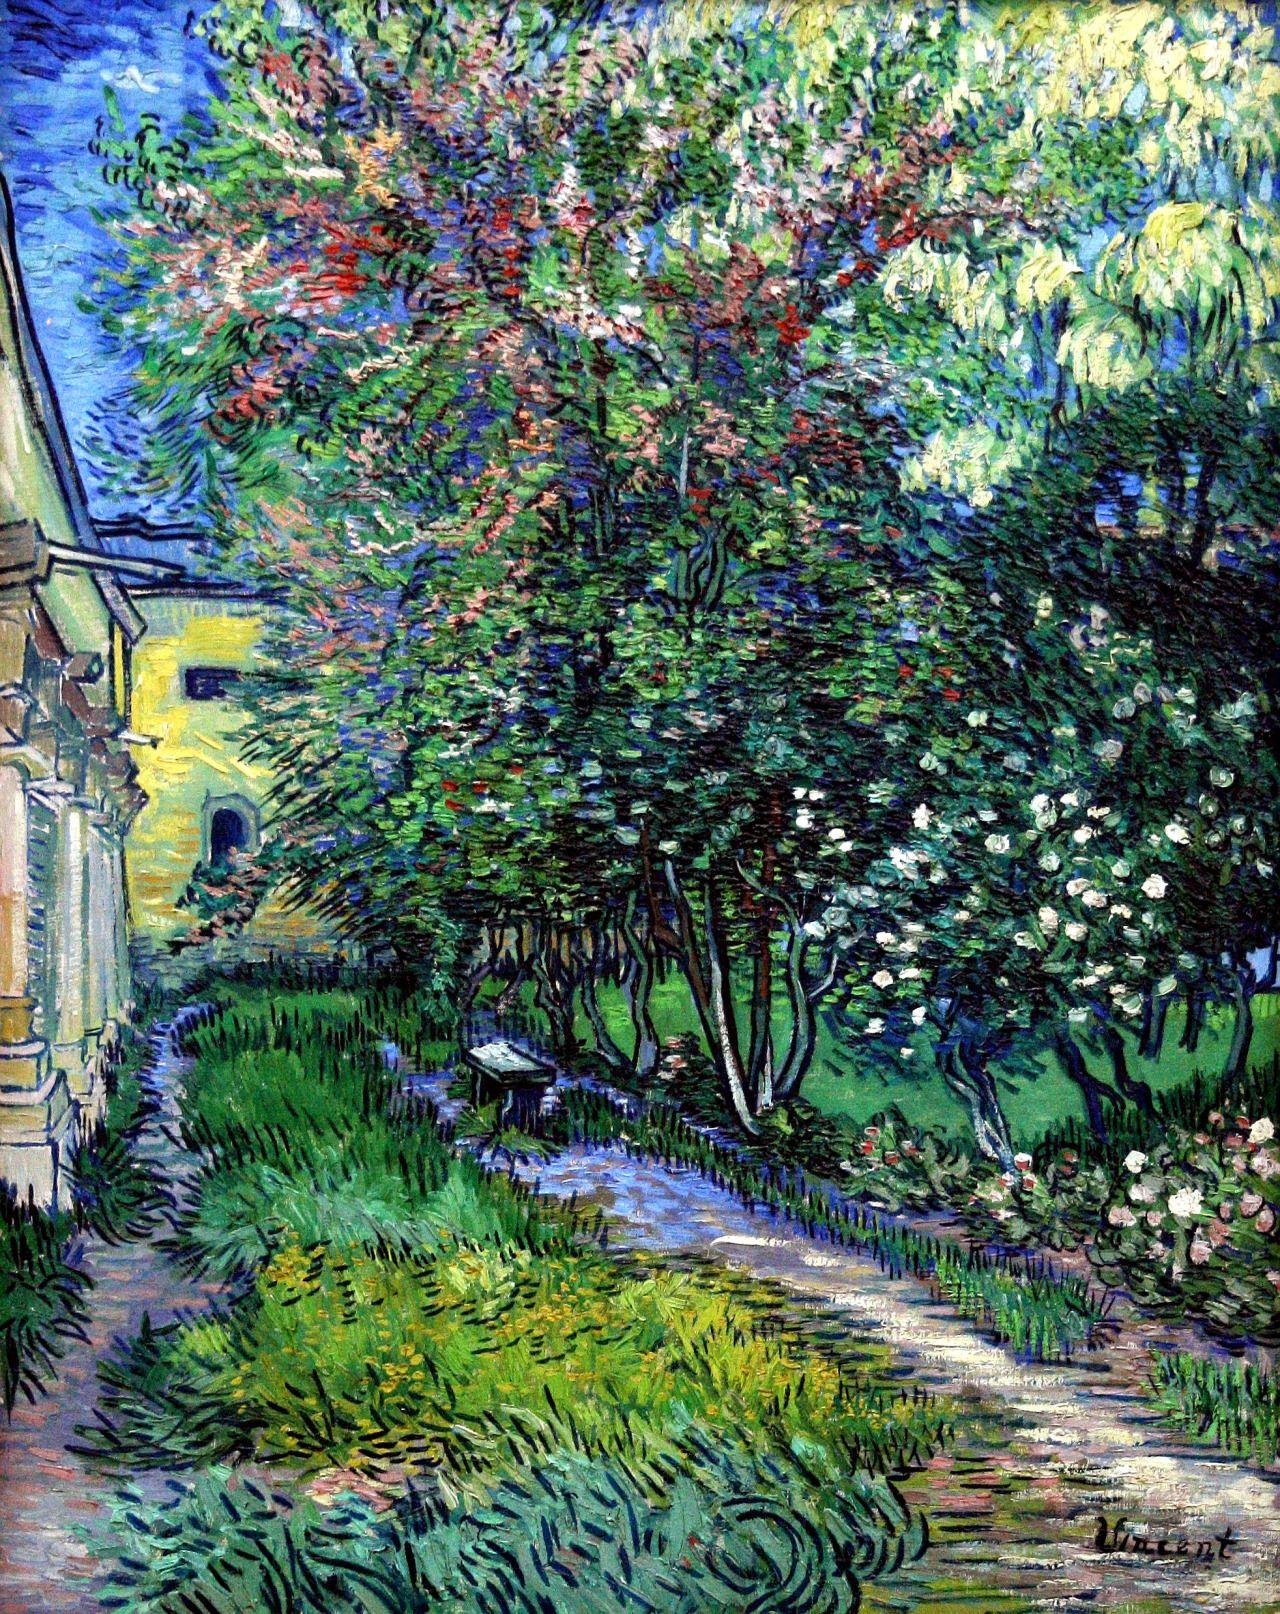 Vincent van Gogh -  The Garden of Saint-Paul Hospital,  1889